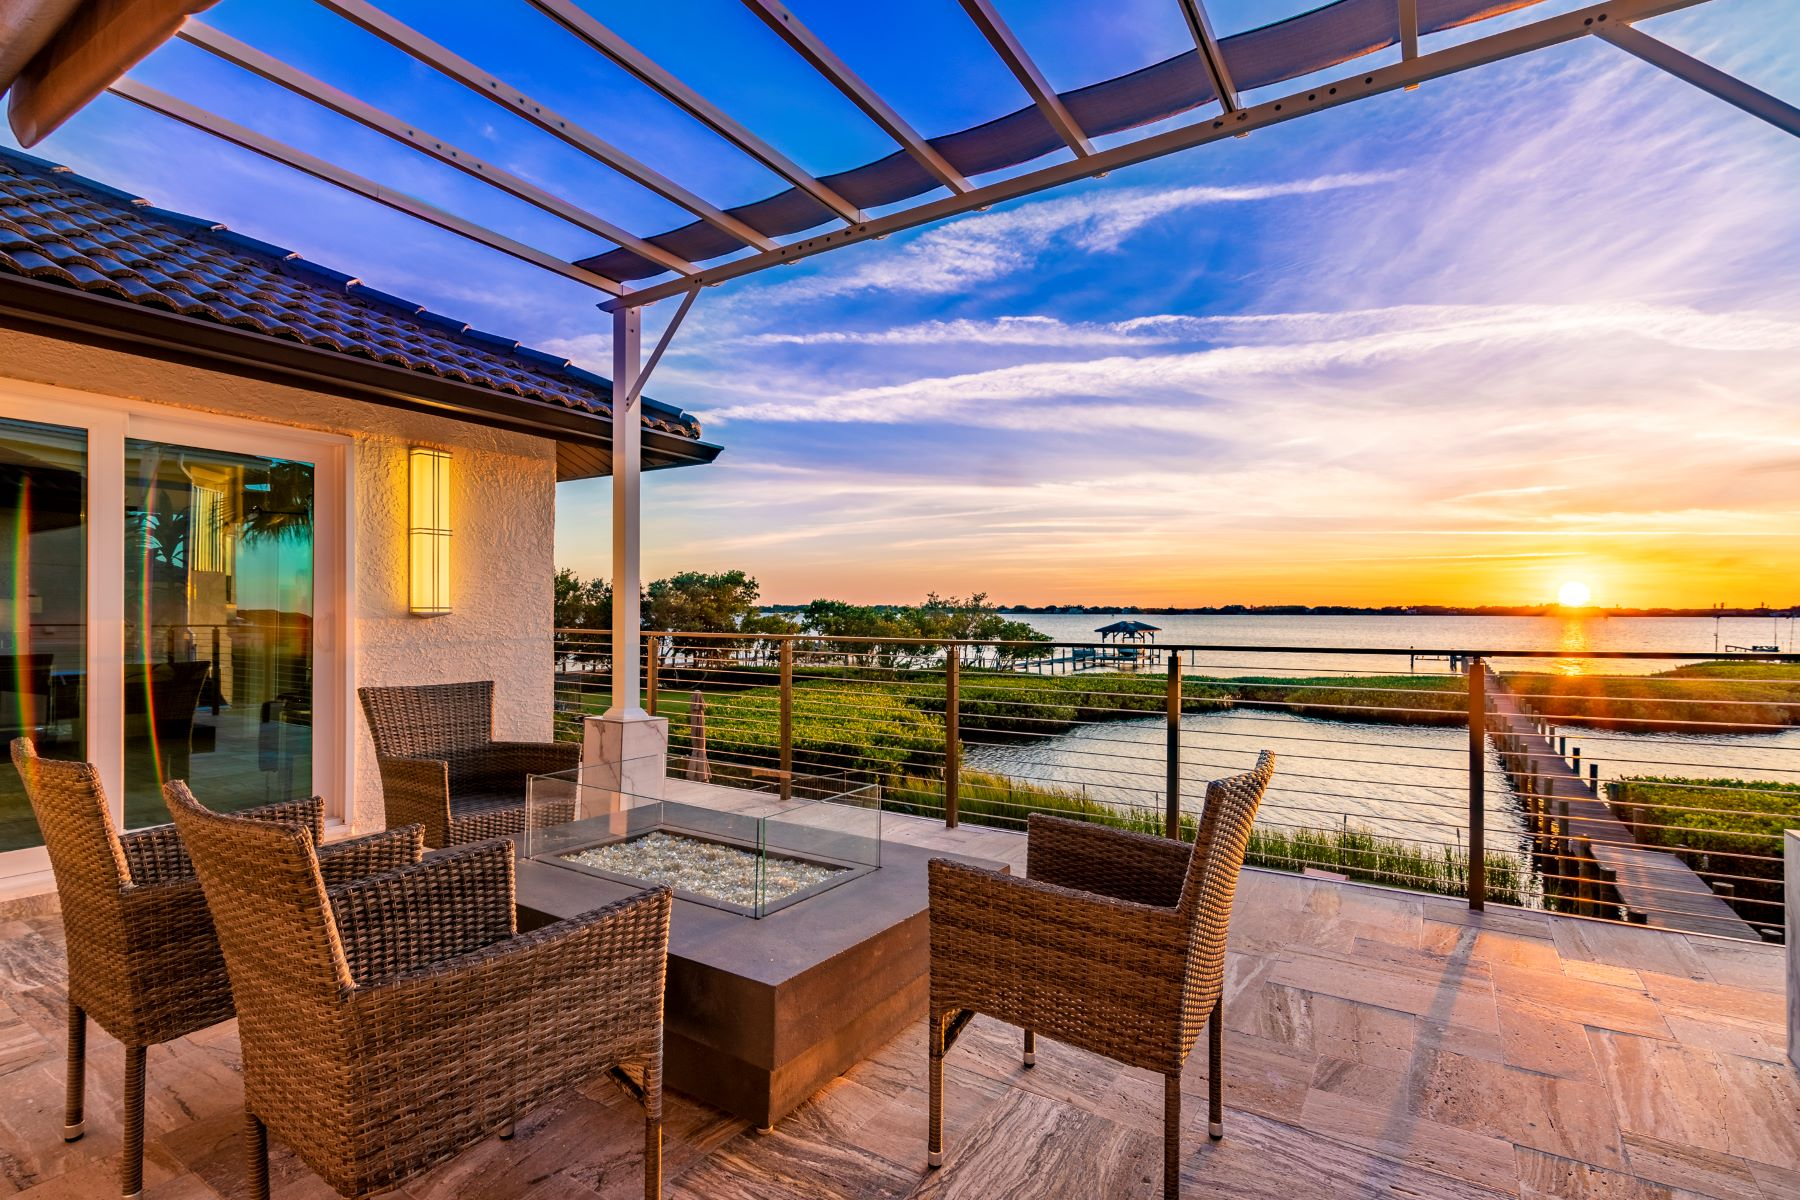 Property για την Πώληση στο 508 Lanternback Island Drive Satellite Beach, Φλοριντα 32937 Ηνωμένες Πολιτείες